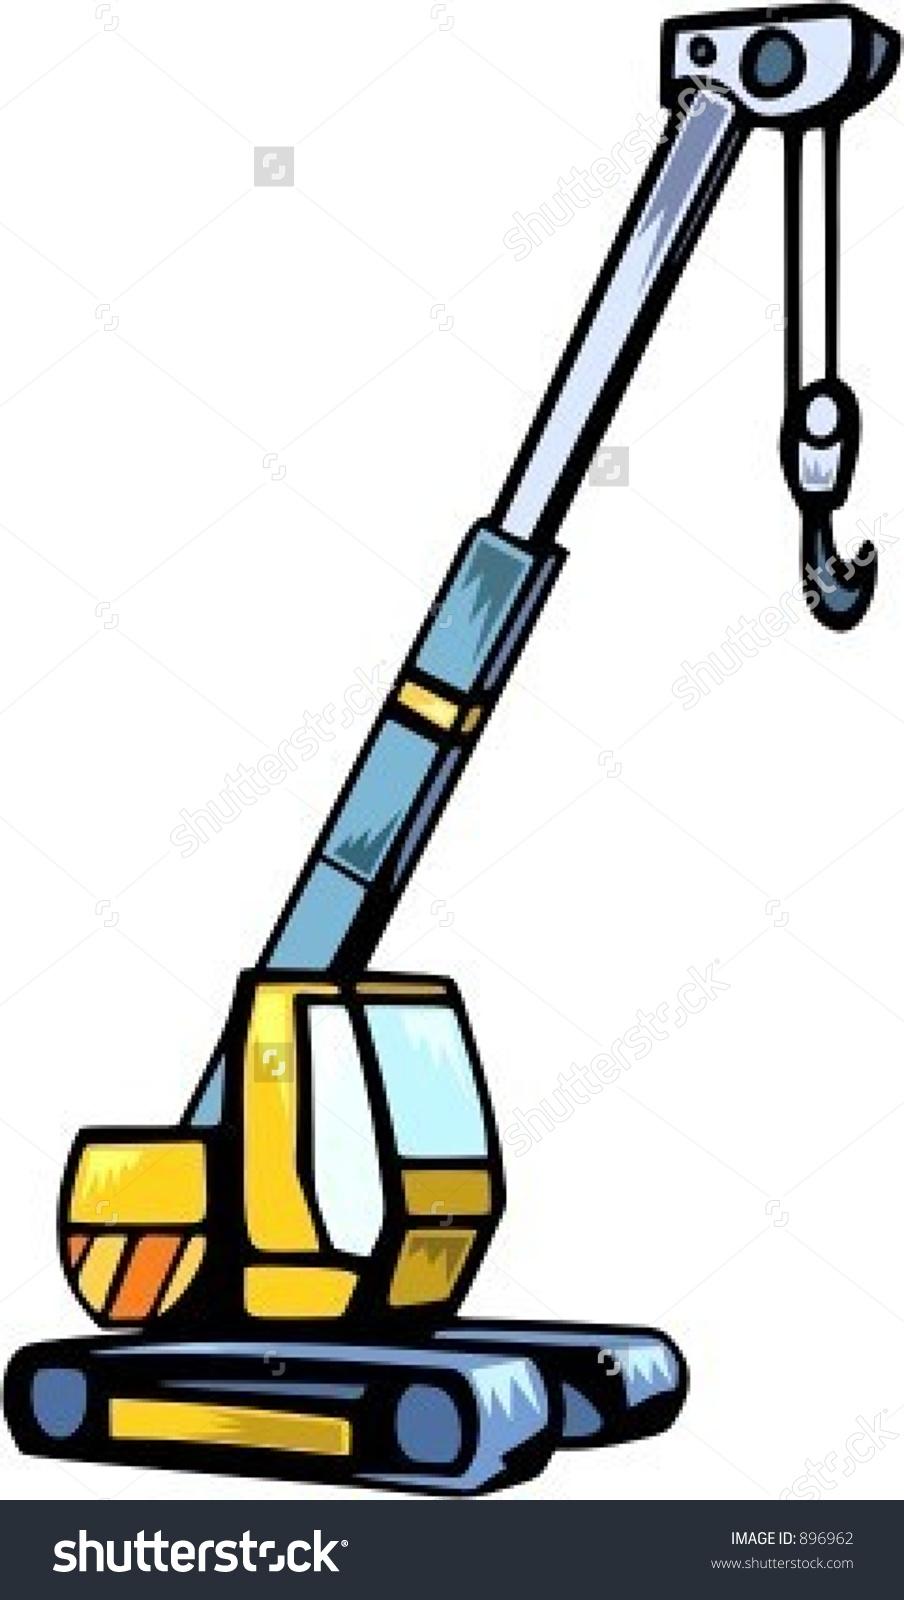 904x1600 Truck Crane Clipart